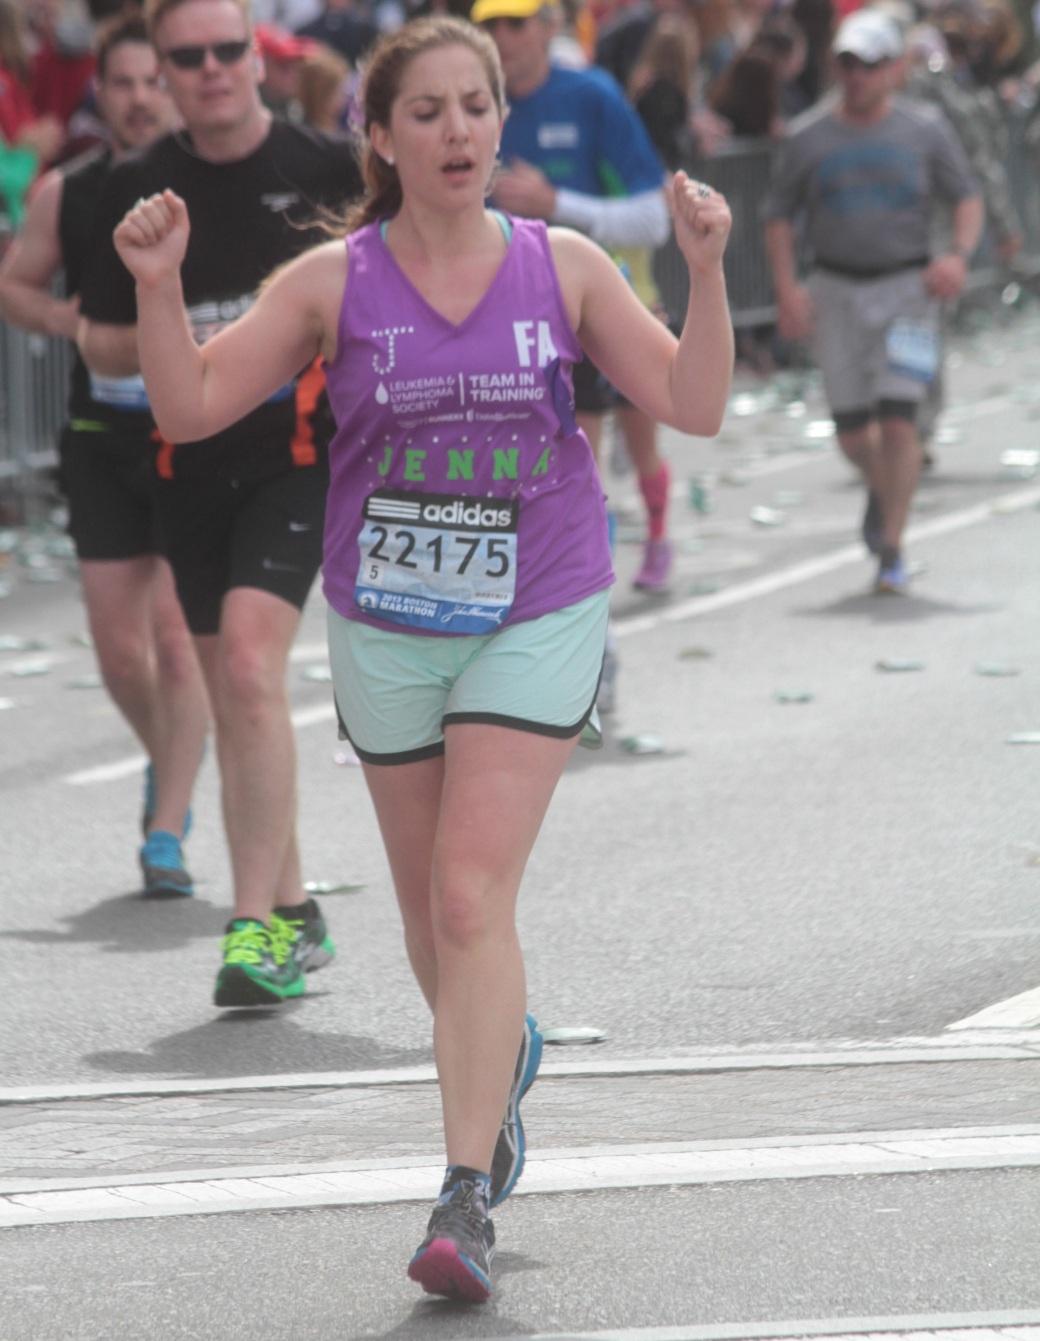 boston marathon 2013 number 22175